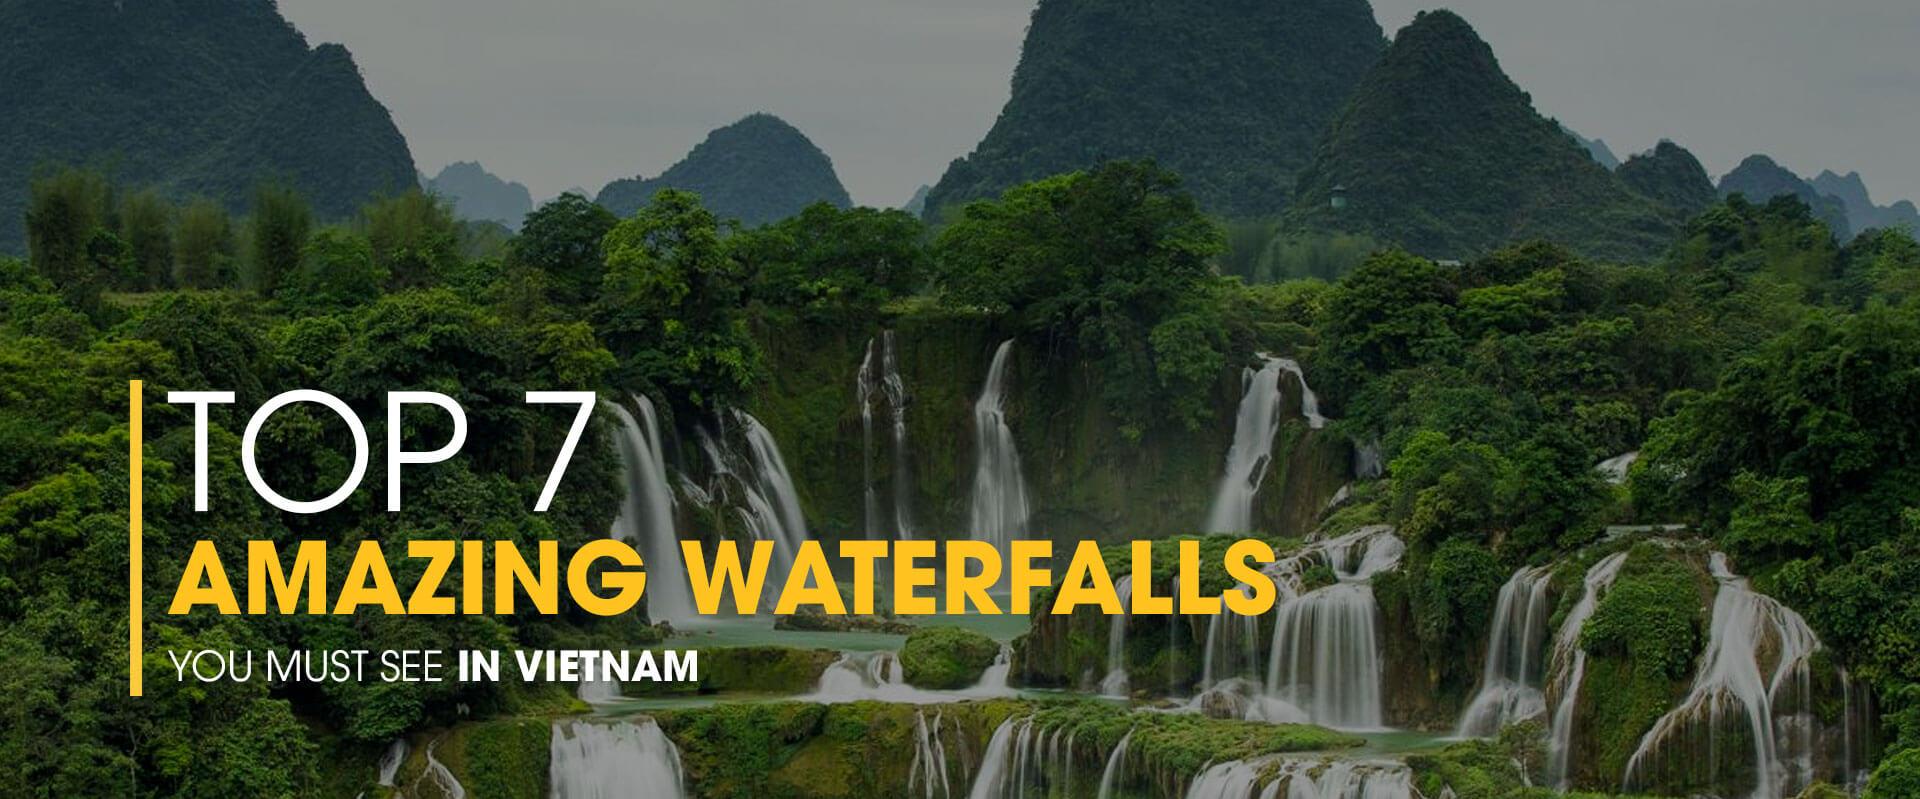 Top 7 Amazing Waterfalls in Vietnam » Exotic Voyages